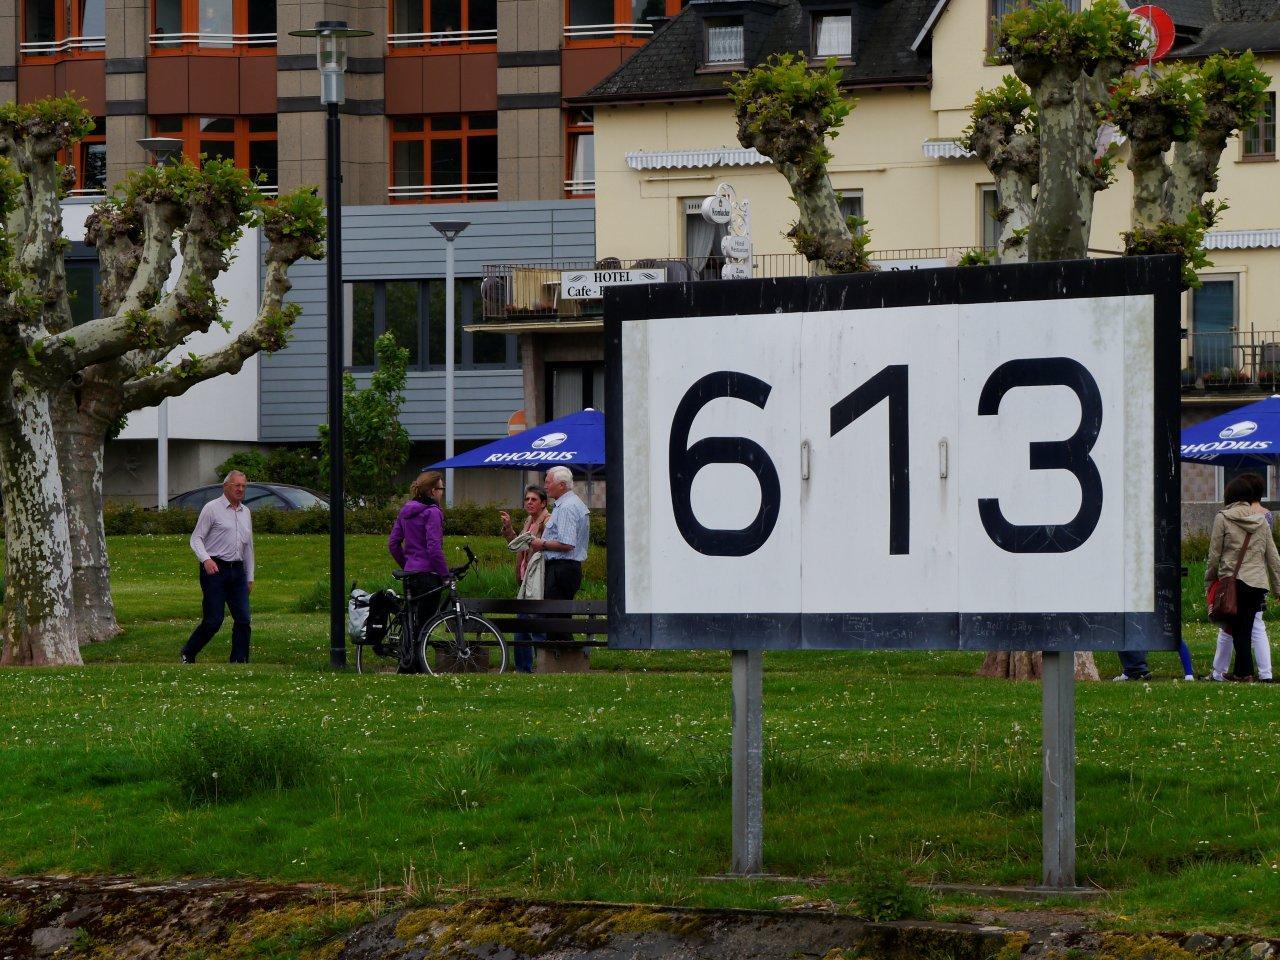 Rheinkilometer-613